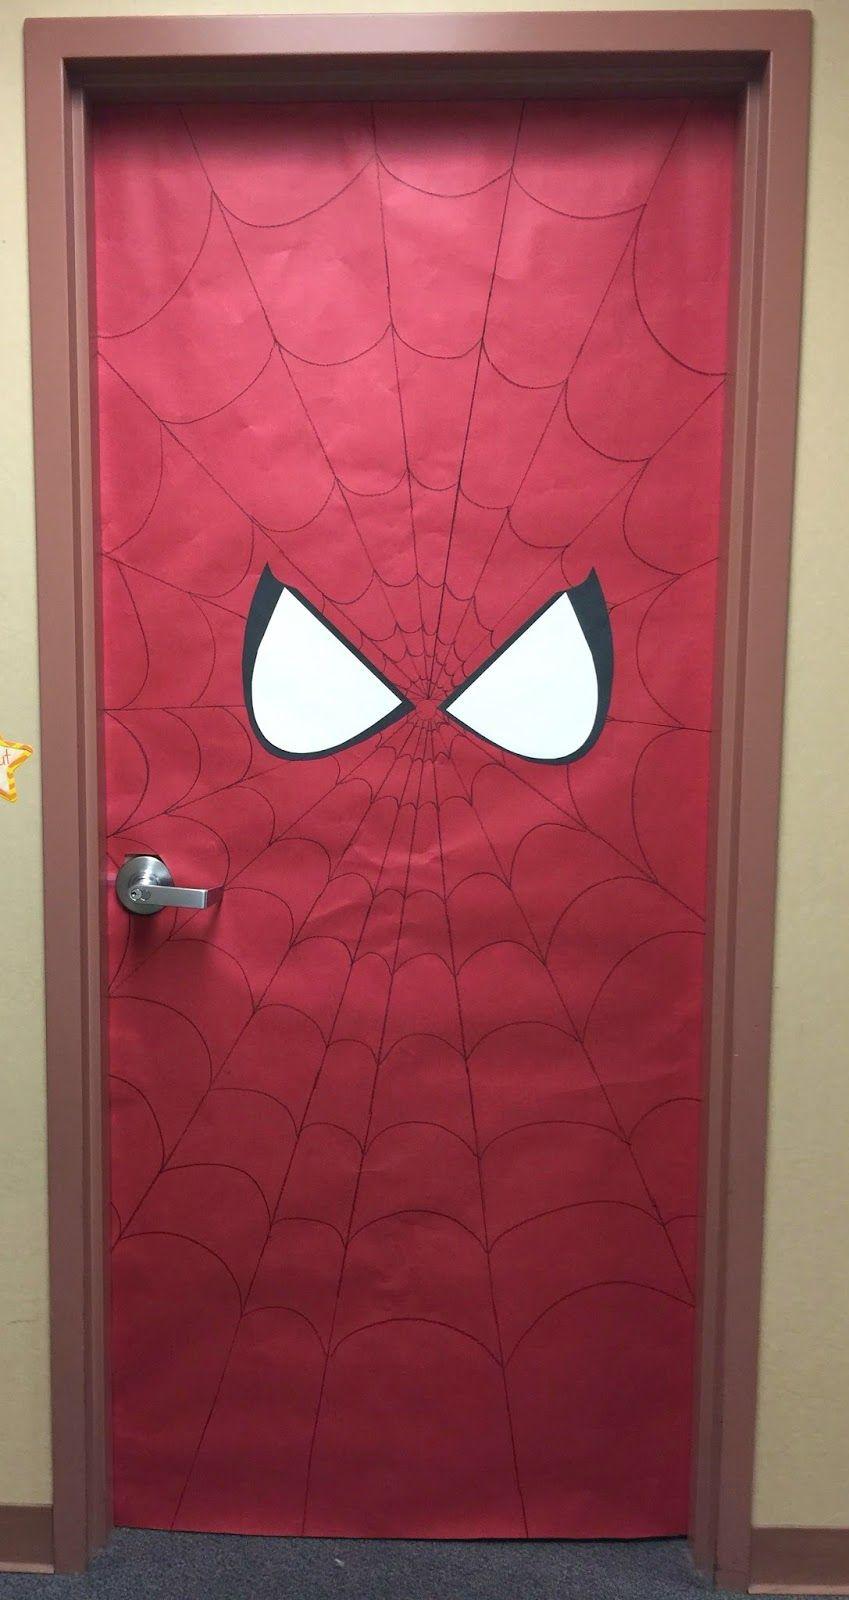 Spiderman Door · Geburtstagsparty IdeenEinladung Kindergeburtstag GeburtstagskuchenSommerfestFabelwesenKlassenzimmerKinderkramEinladungen Englisch